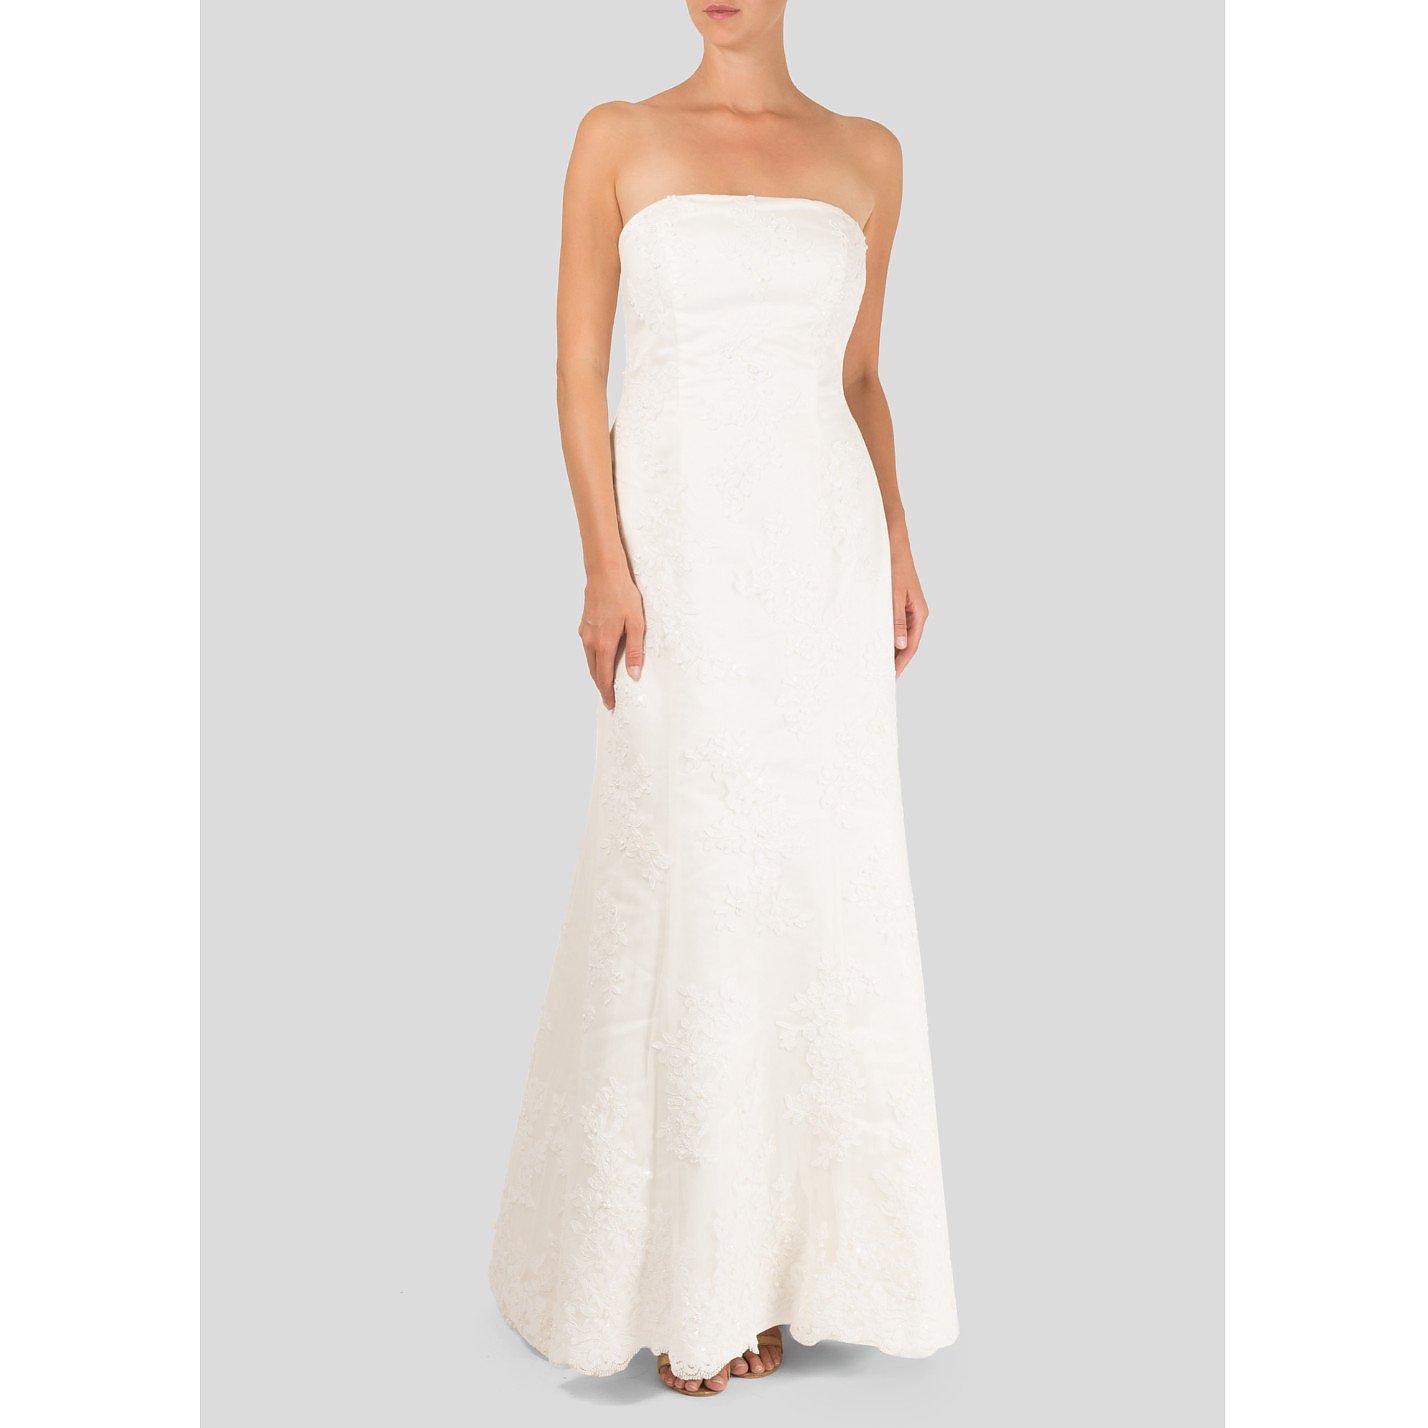 Pronuptia Strapless Embroidered Bridal Dress